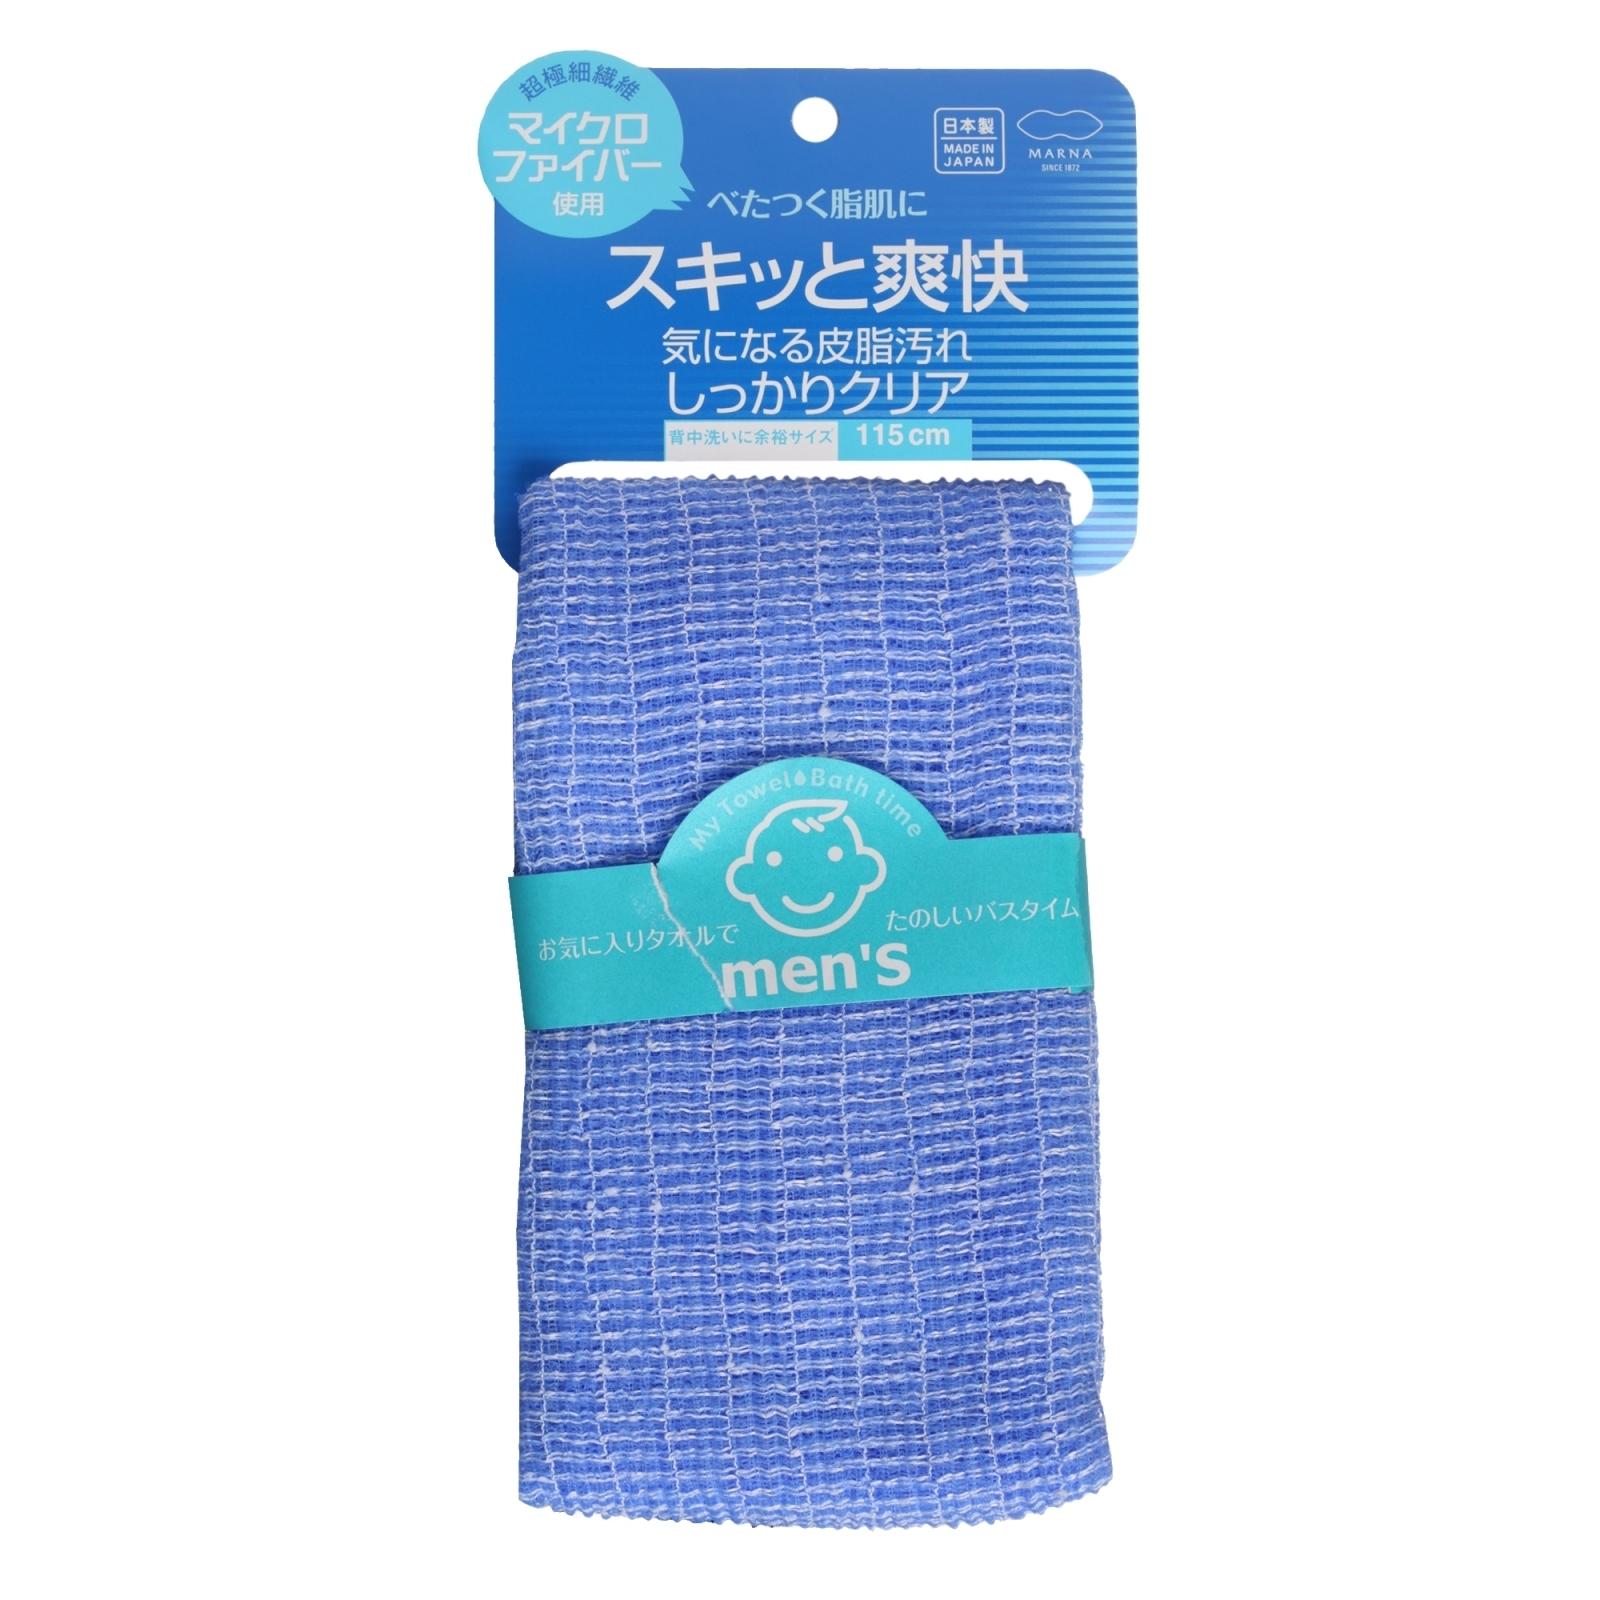 Мочалка для мужчин Marna из микрофирбы 1 шт (Marna Cosmetics)